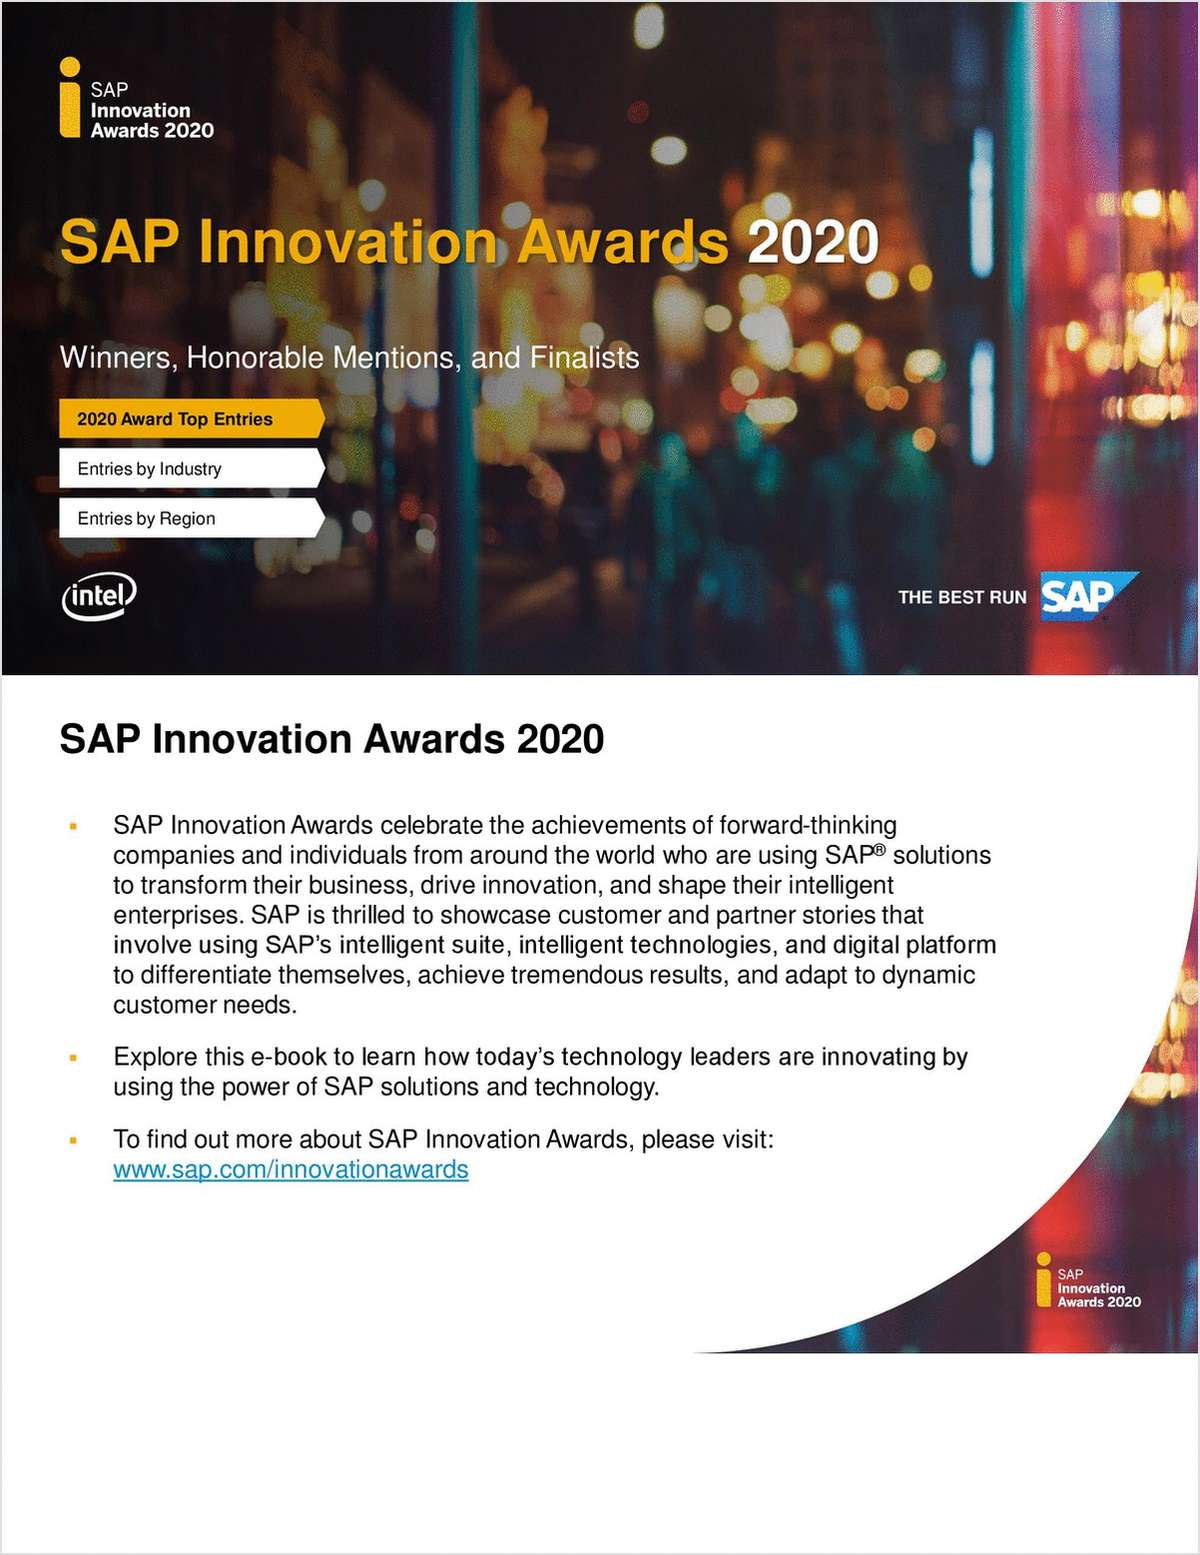 SAP Innovation Awards 2020